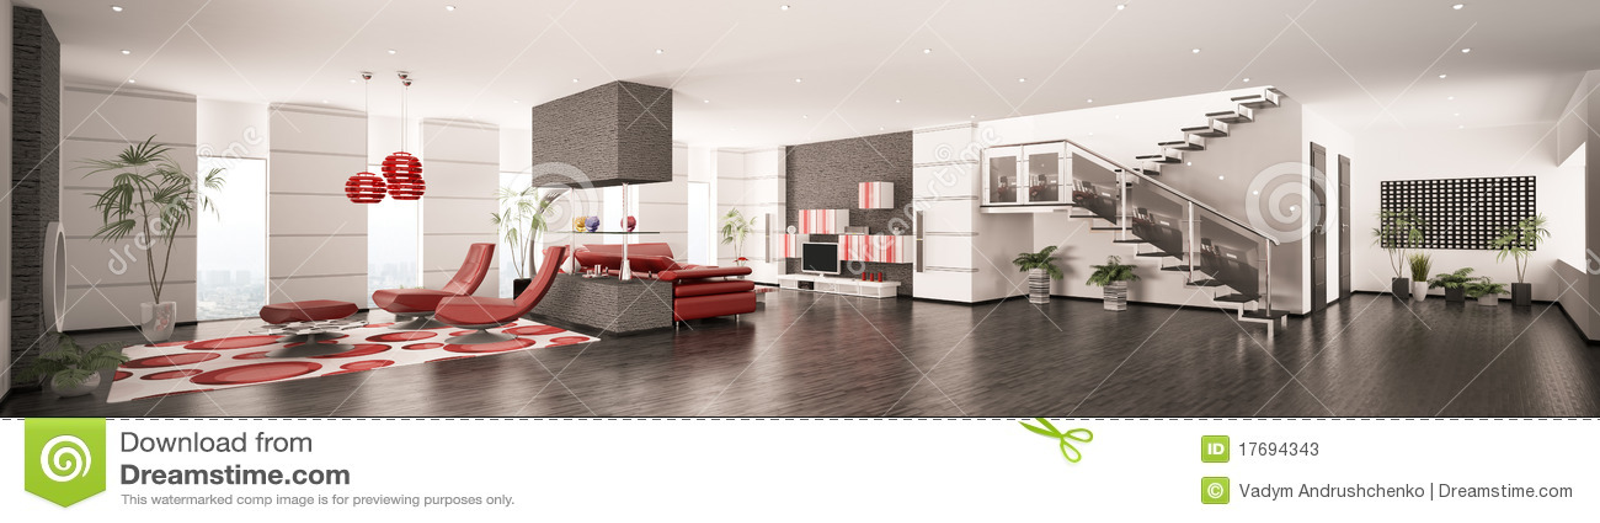 панорама квартиры 3d нутряная самомоднейшая представляет